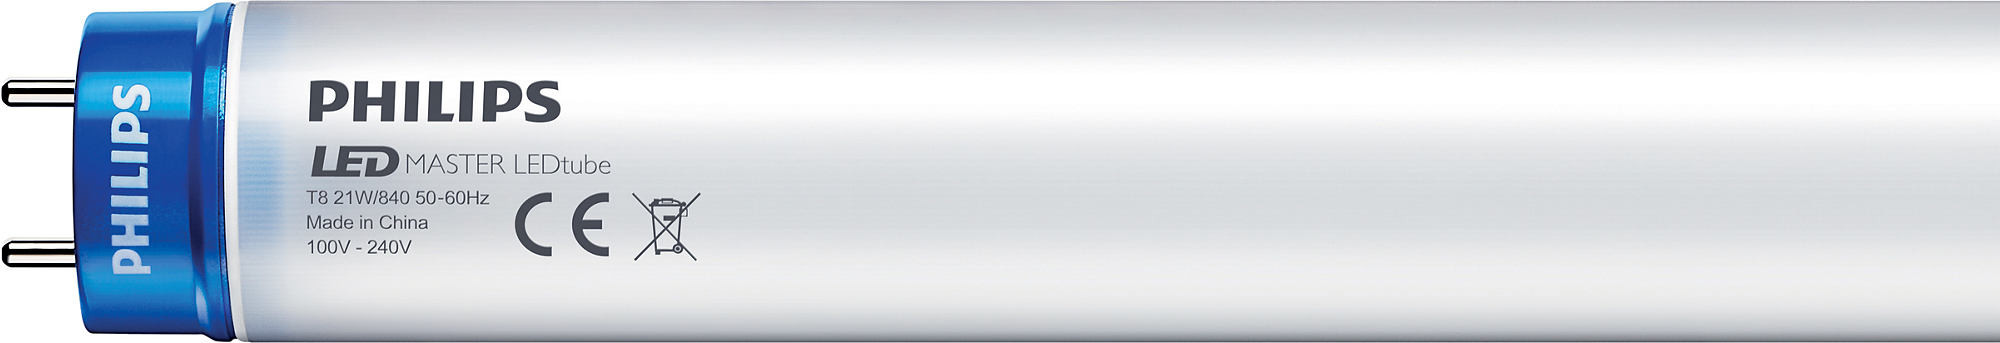 Philips MASTER LEDtube PERF 1500mm 31W 865 T8 C